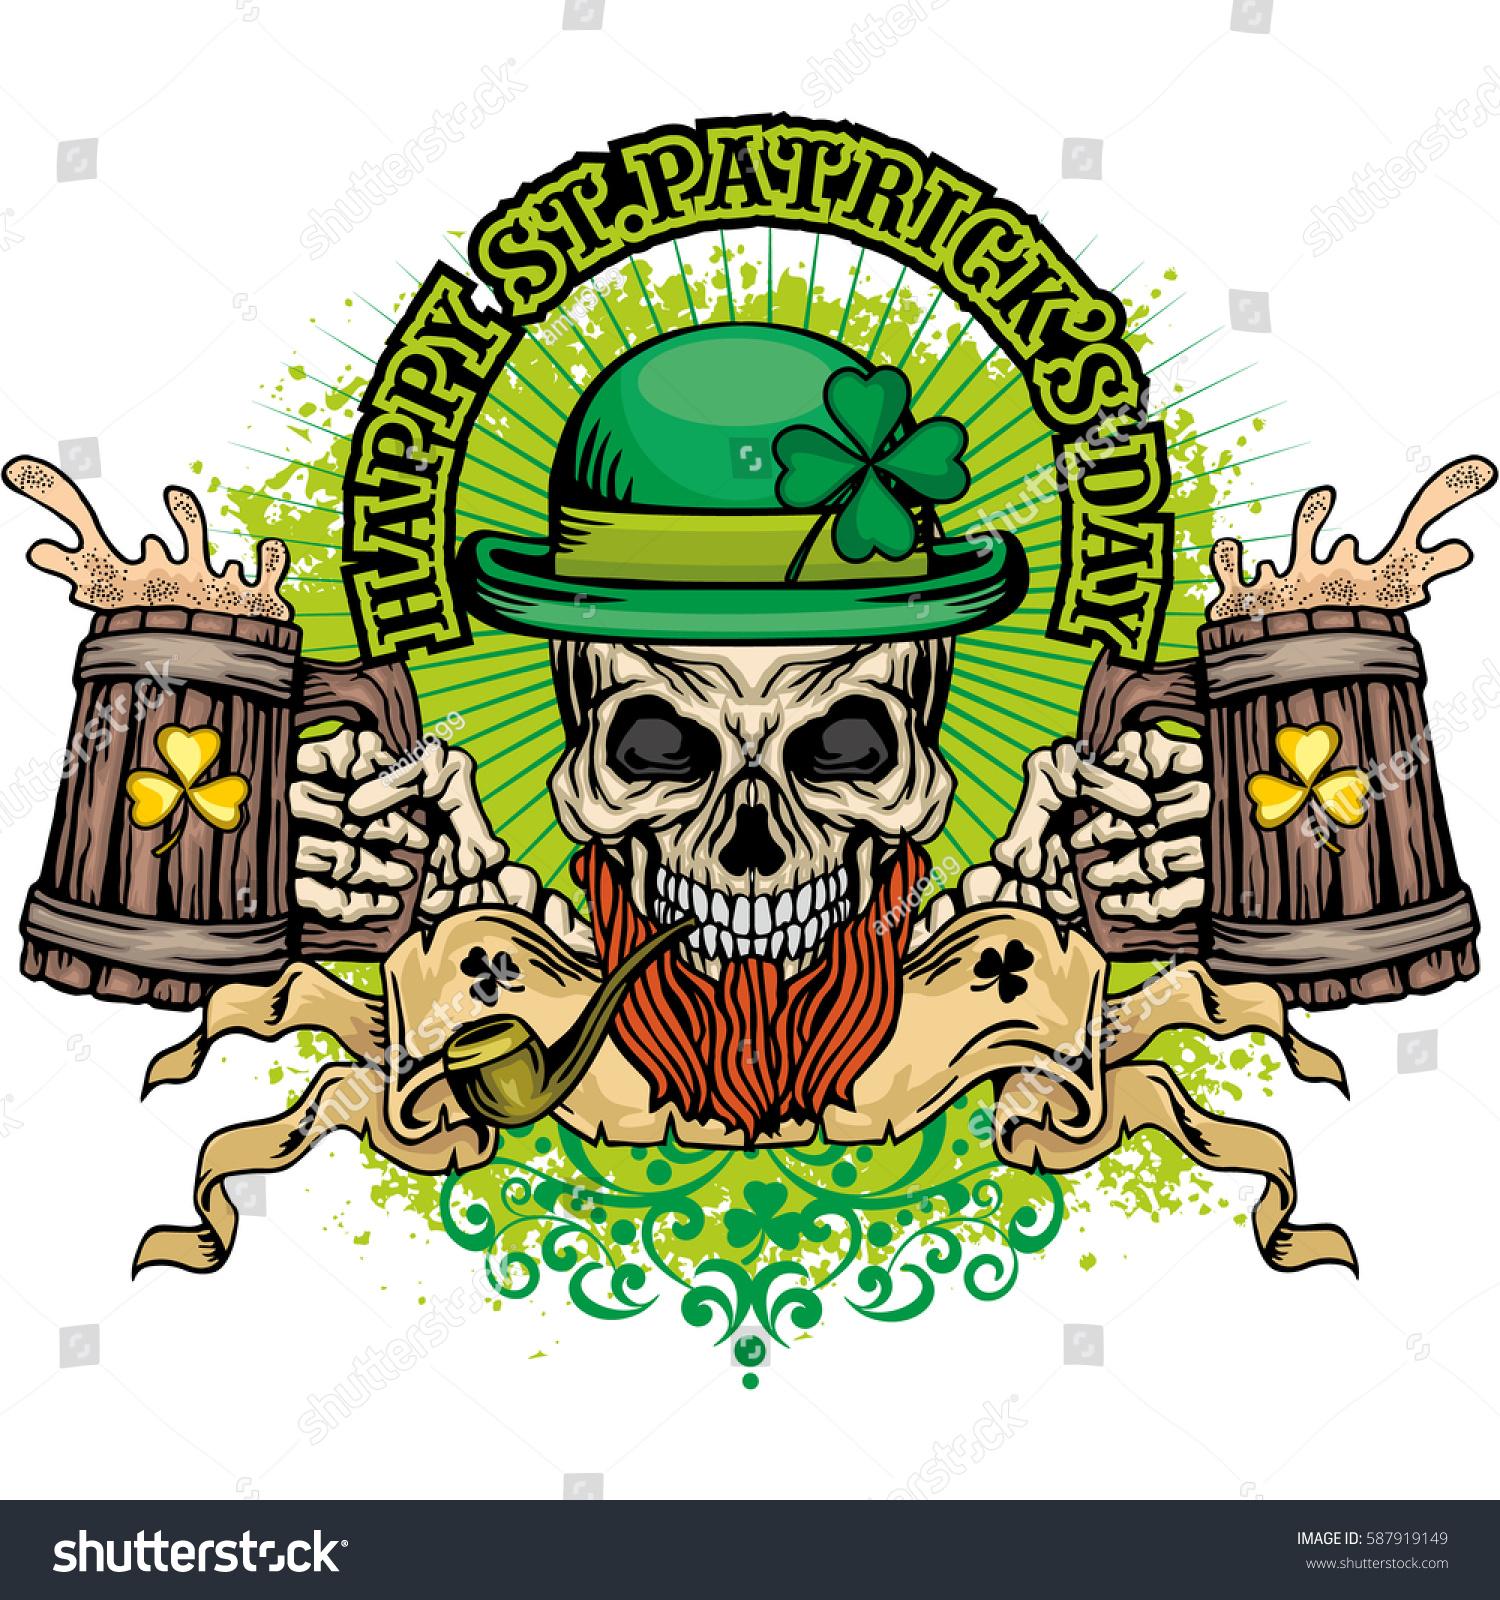 Irish coat arms skull clover grunge stock vector 587919149 irish coat of arms with skull and clover grunge vintage design t shirts buycottarizona Images